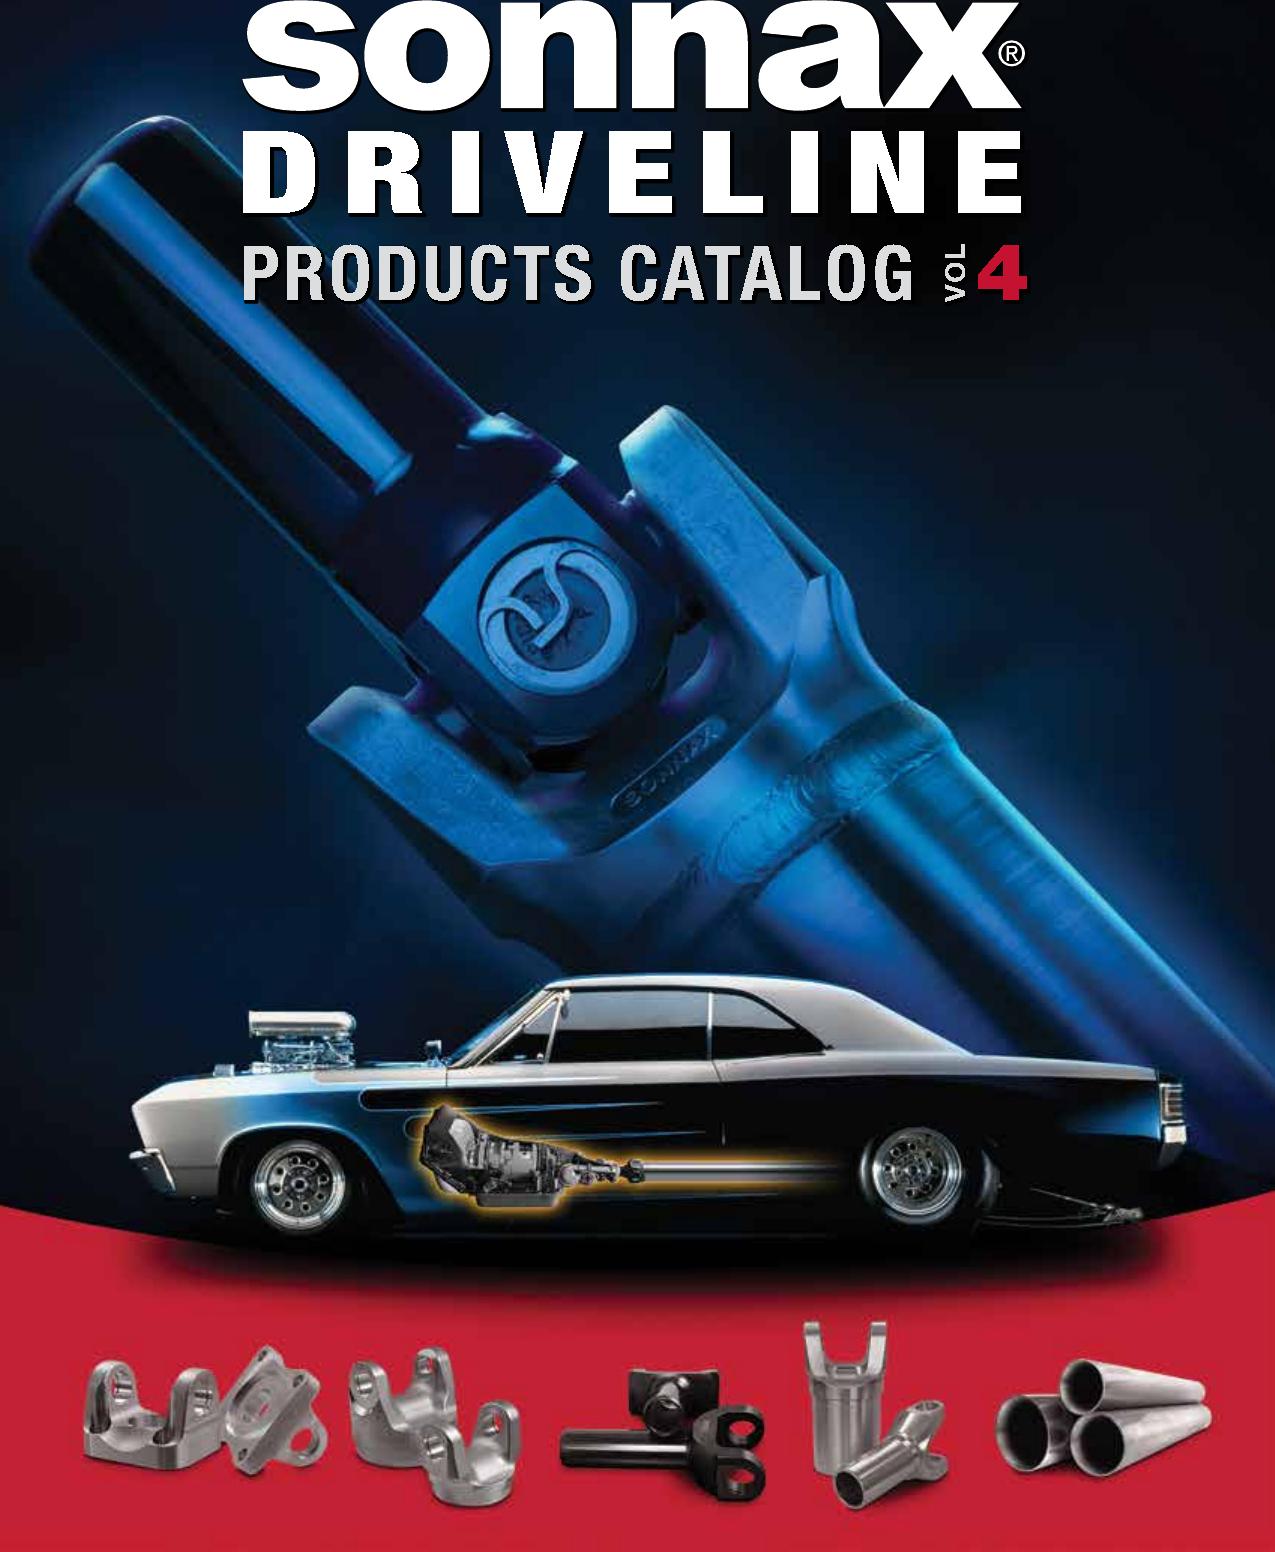 Sonnax Driveline Catalog V4